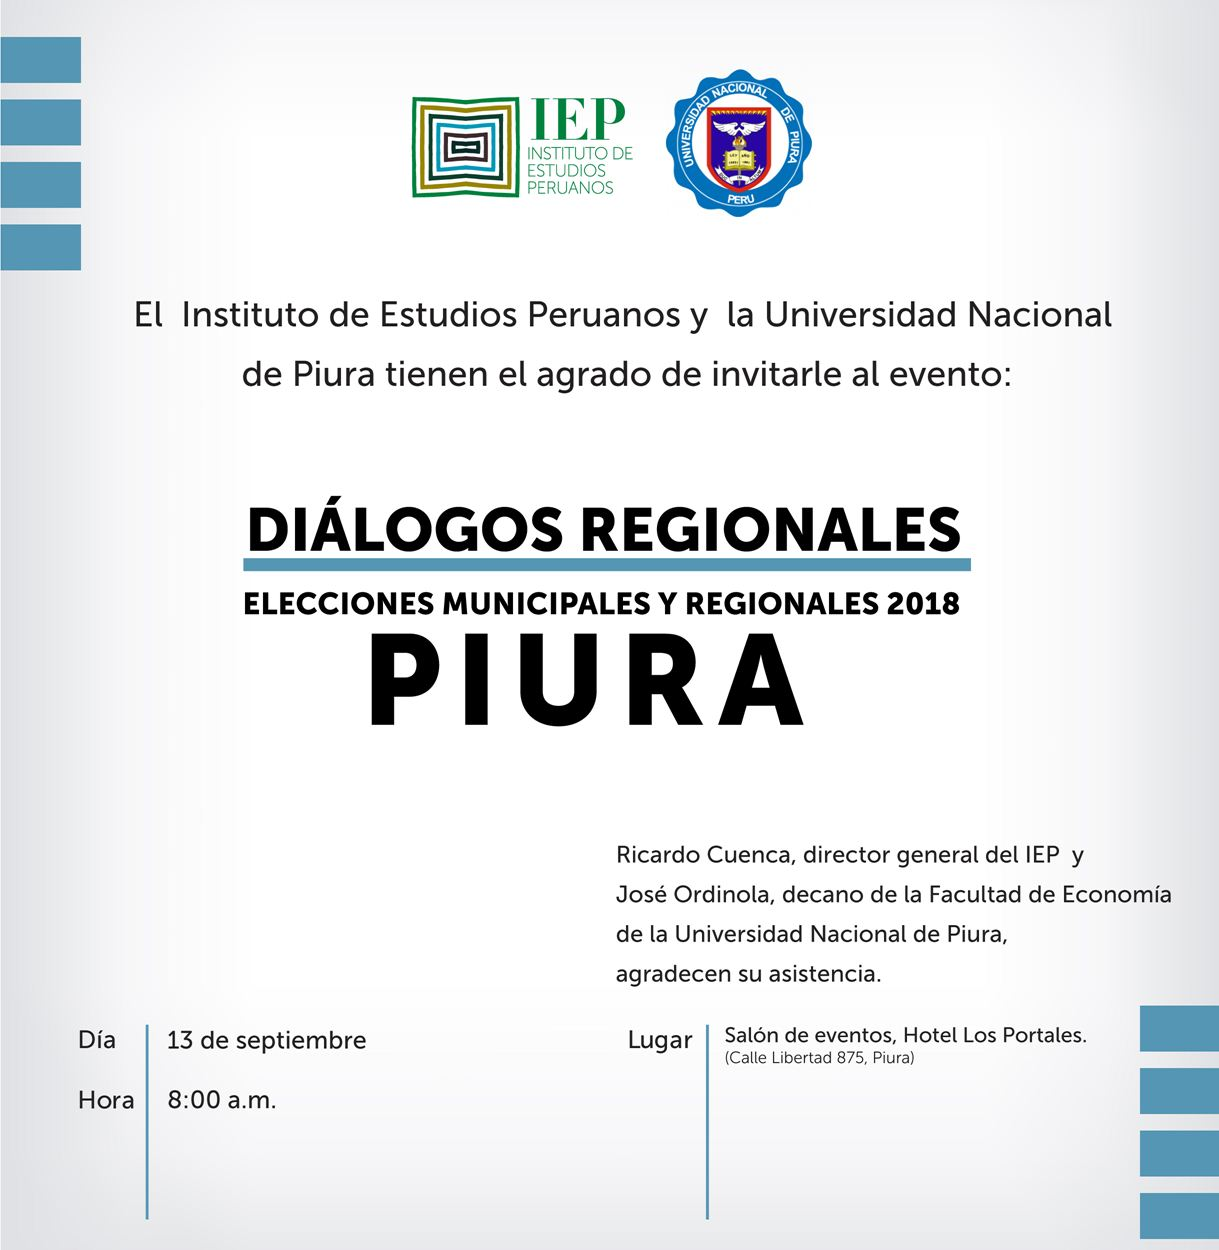 Boletin Digital de la Universidad Nacional de Piura